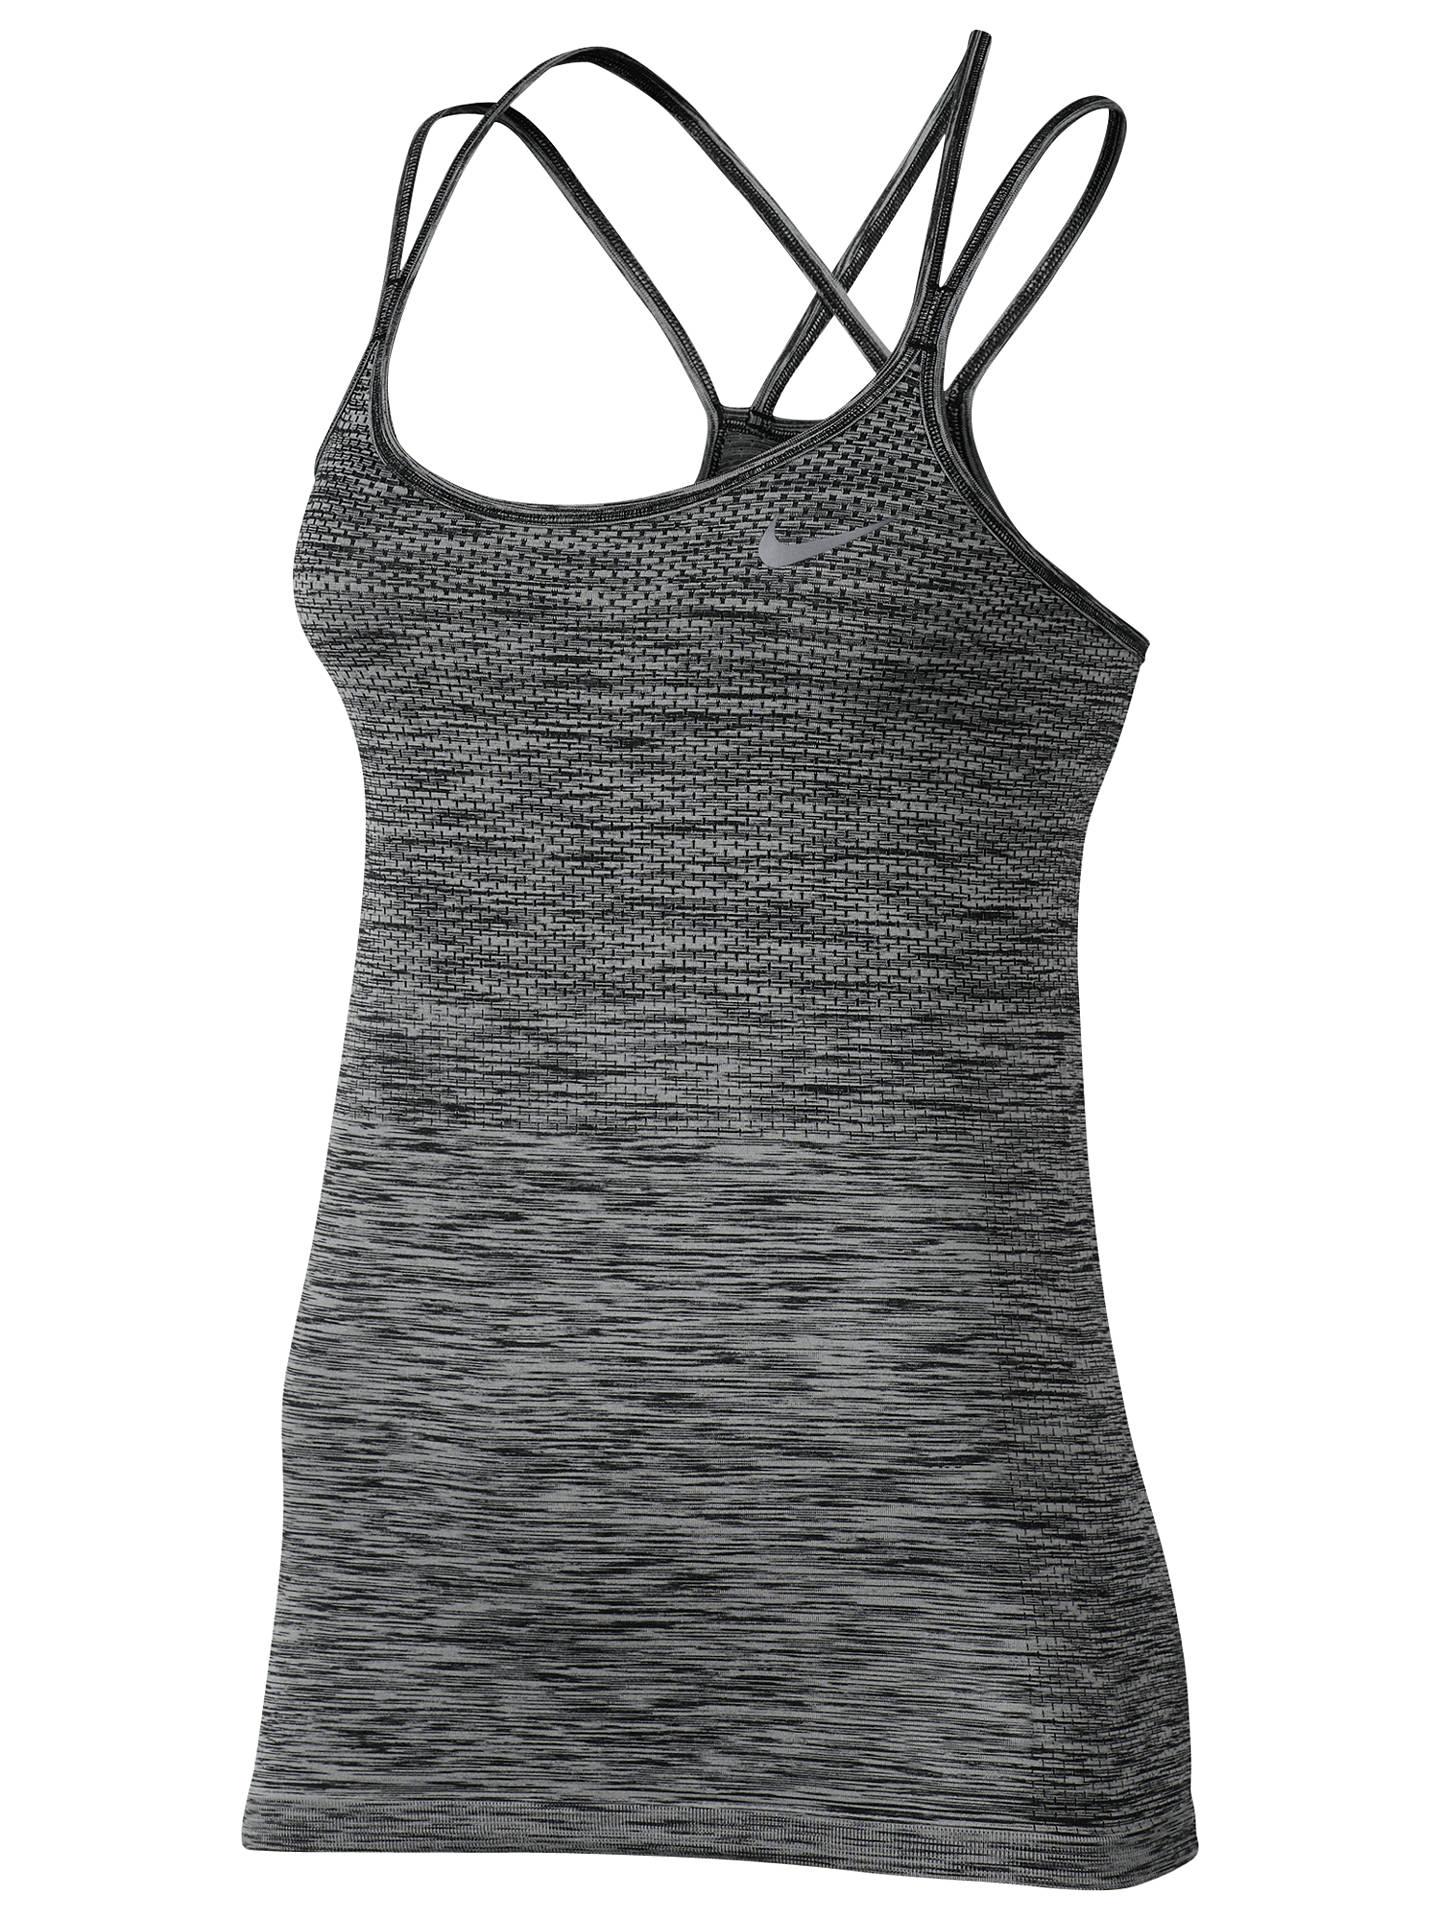 8273d1132ba3a Buy Nike Dri-FIT Knit Racerback Running Tank Top